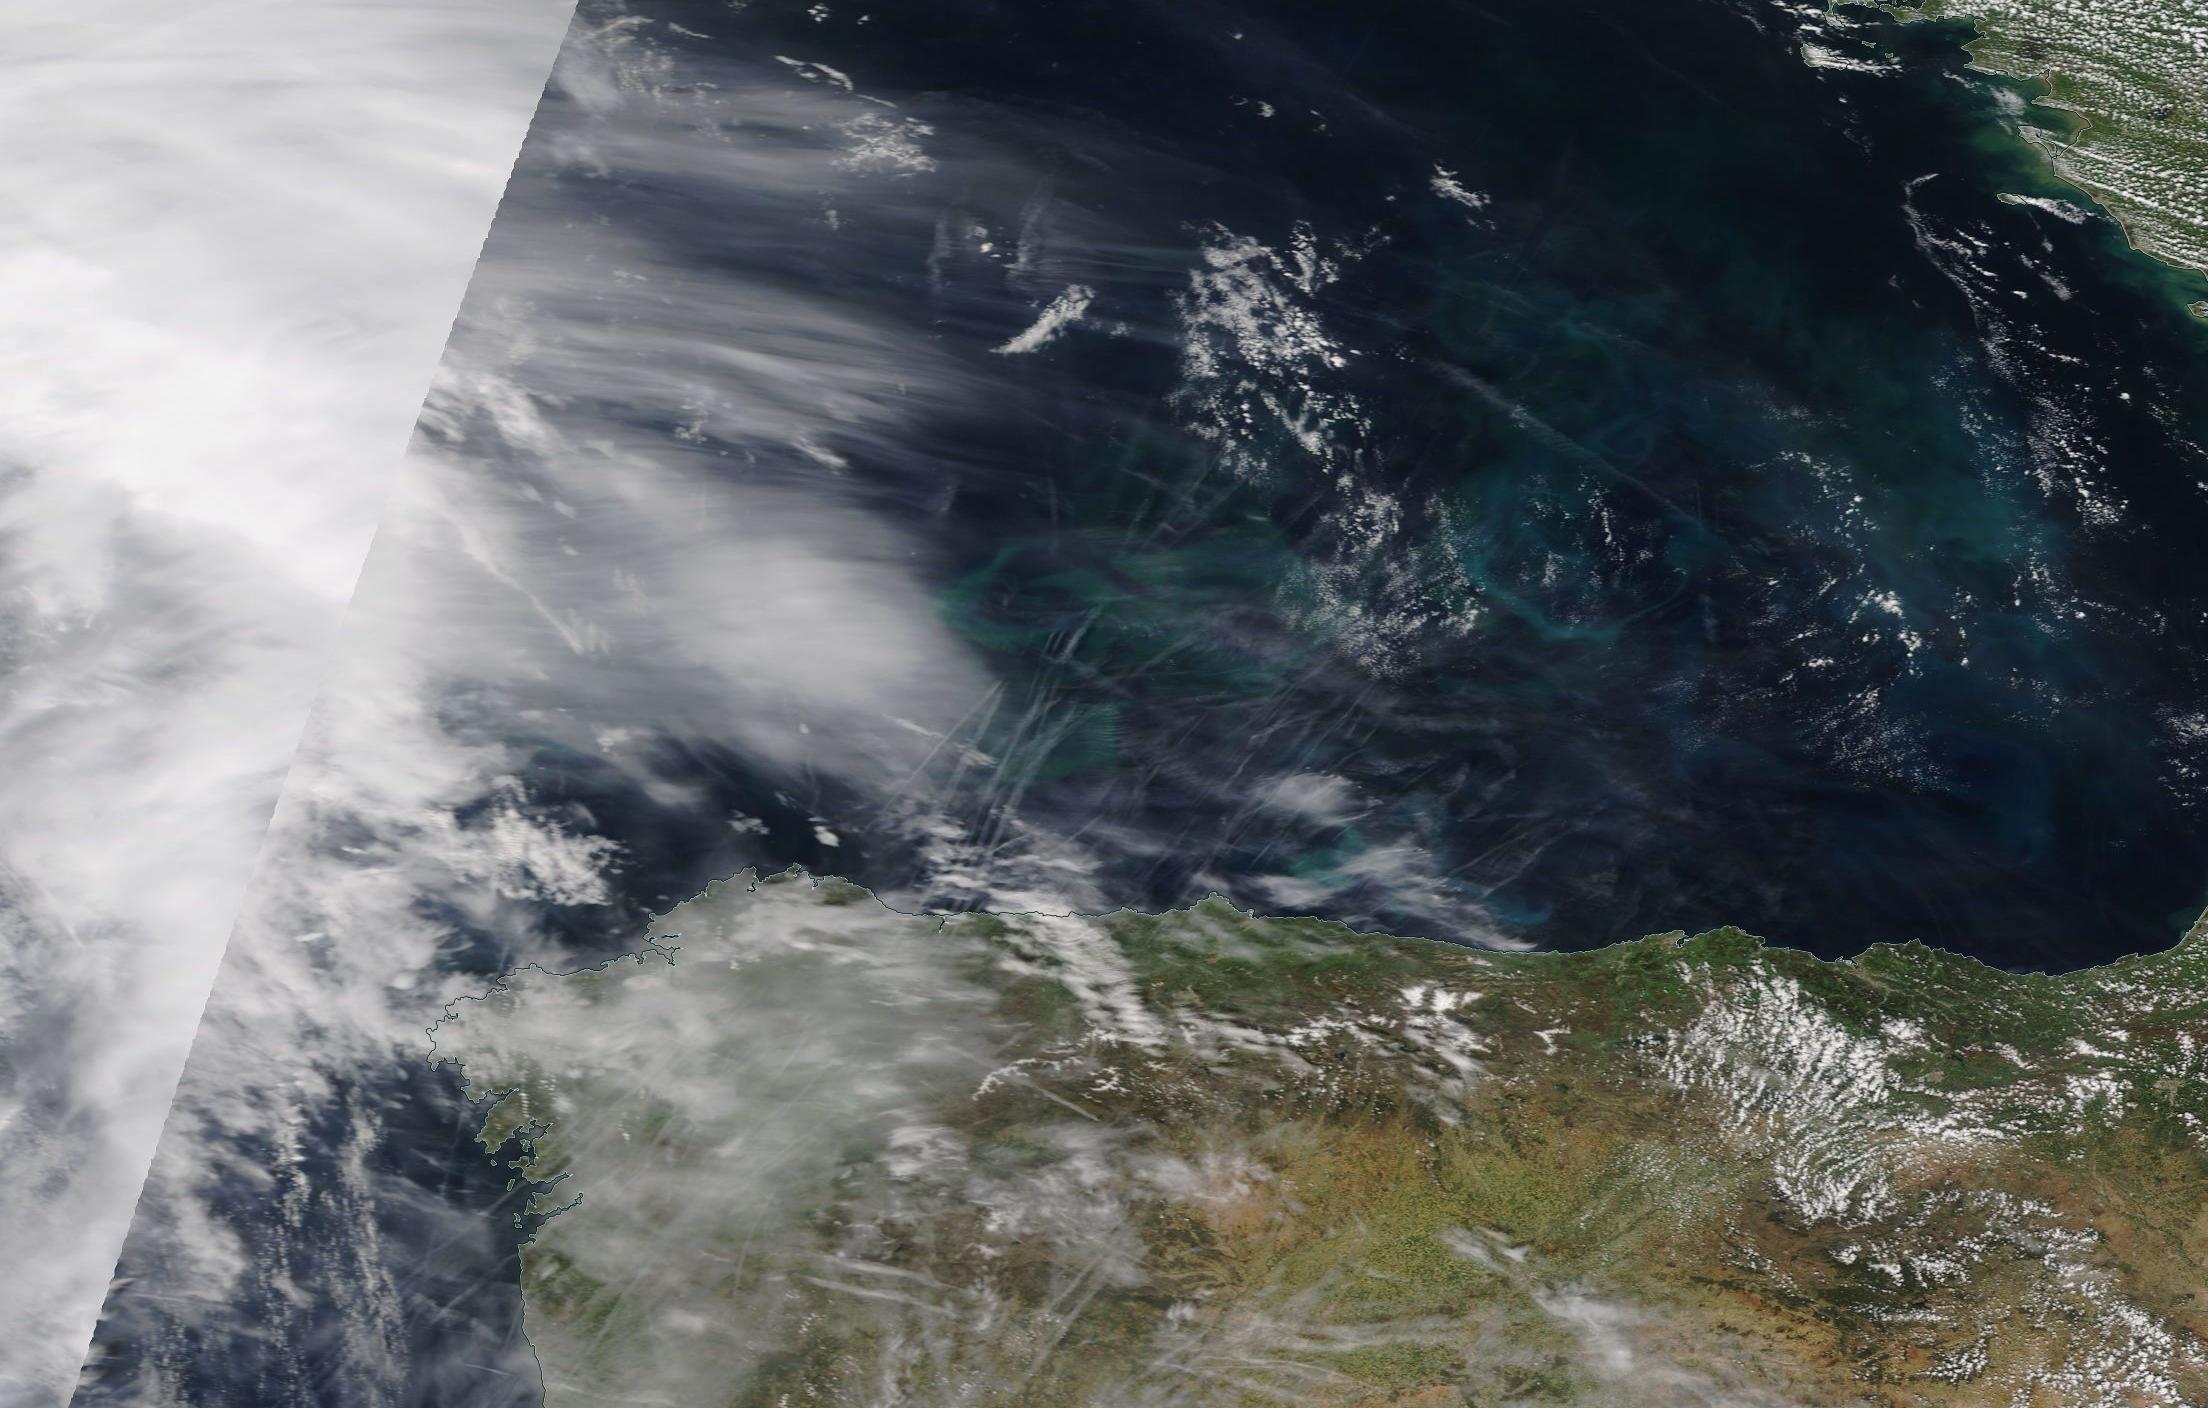 chemtrails geoengineering Costa Verde northern Spain ... https://go.nasa.gov/2GkKc61